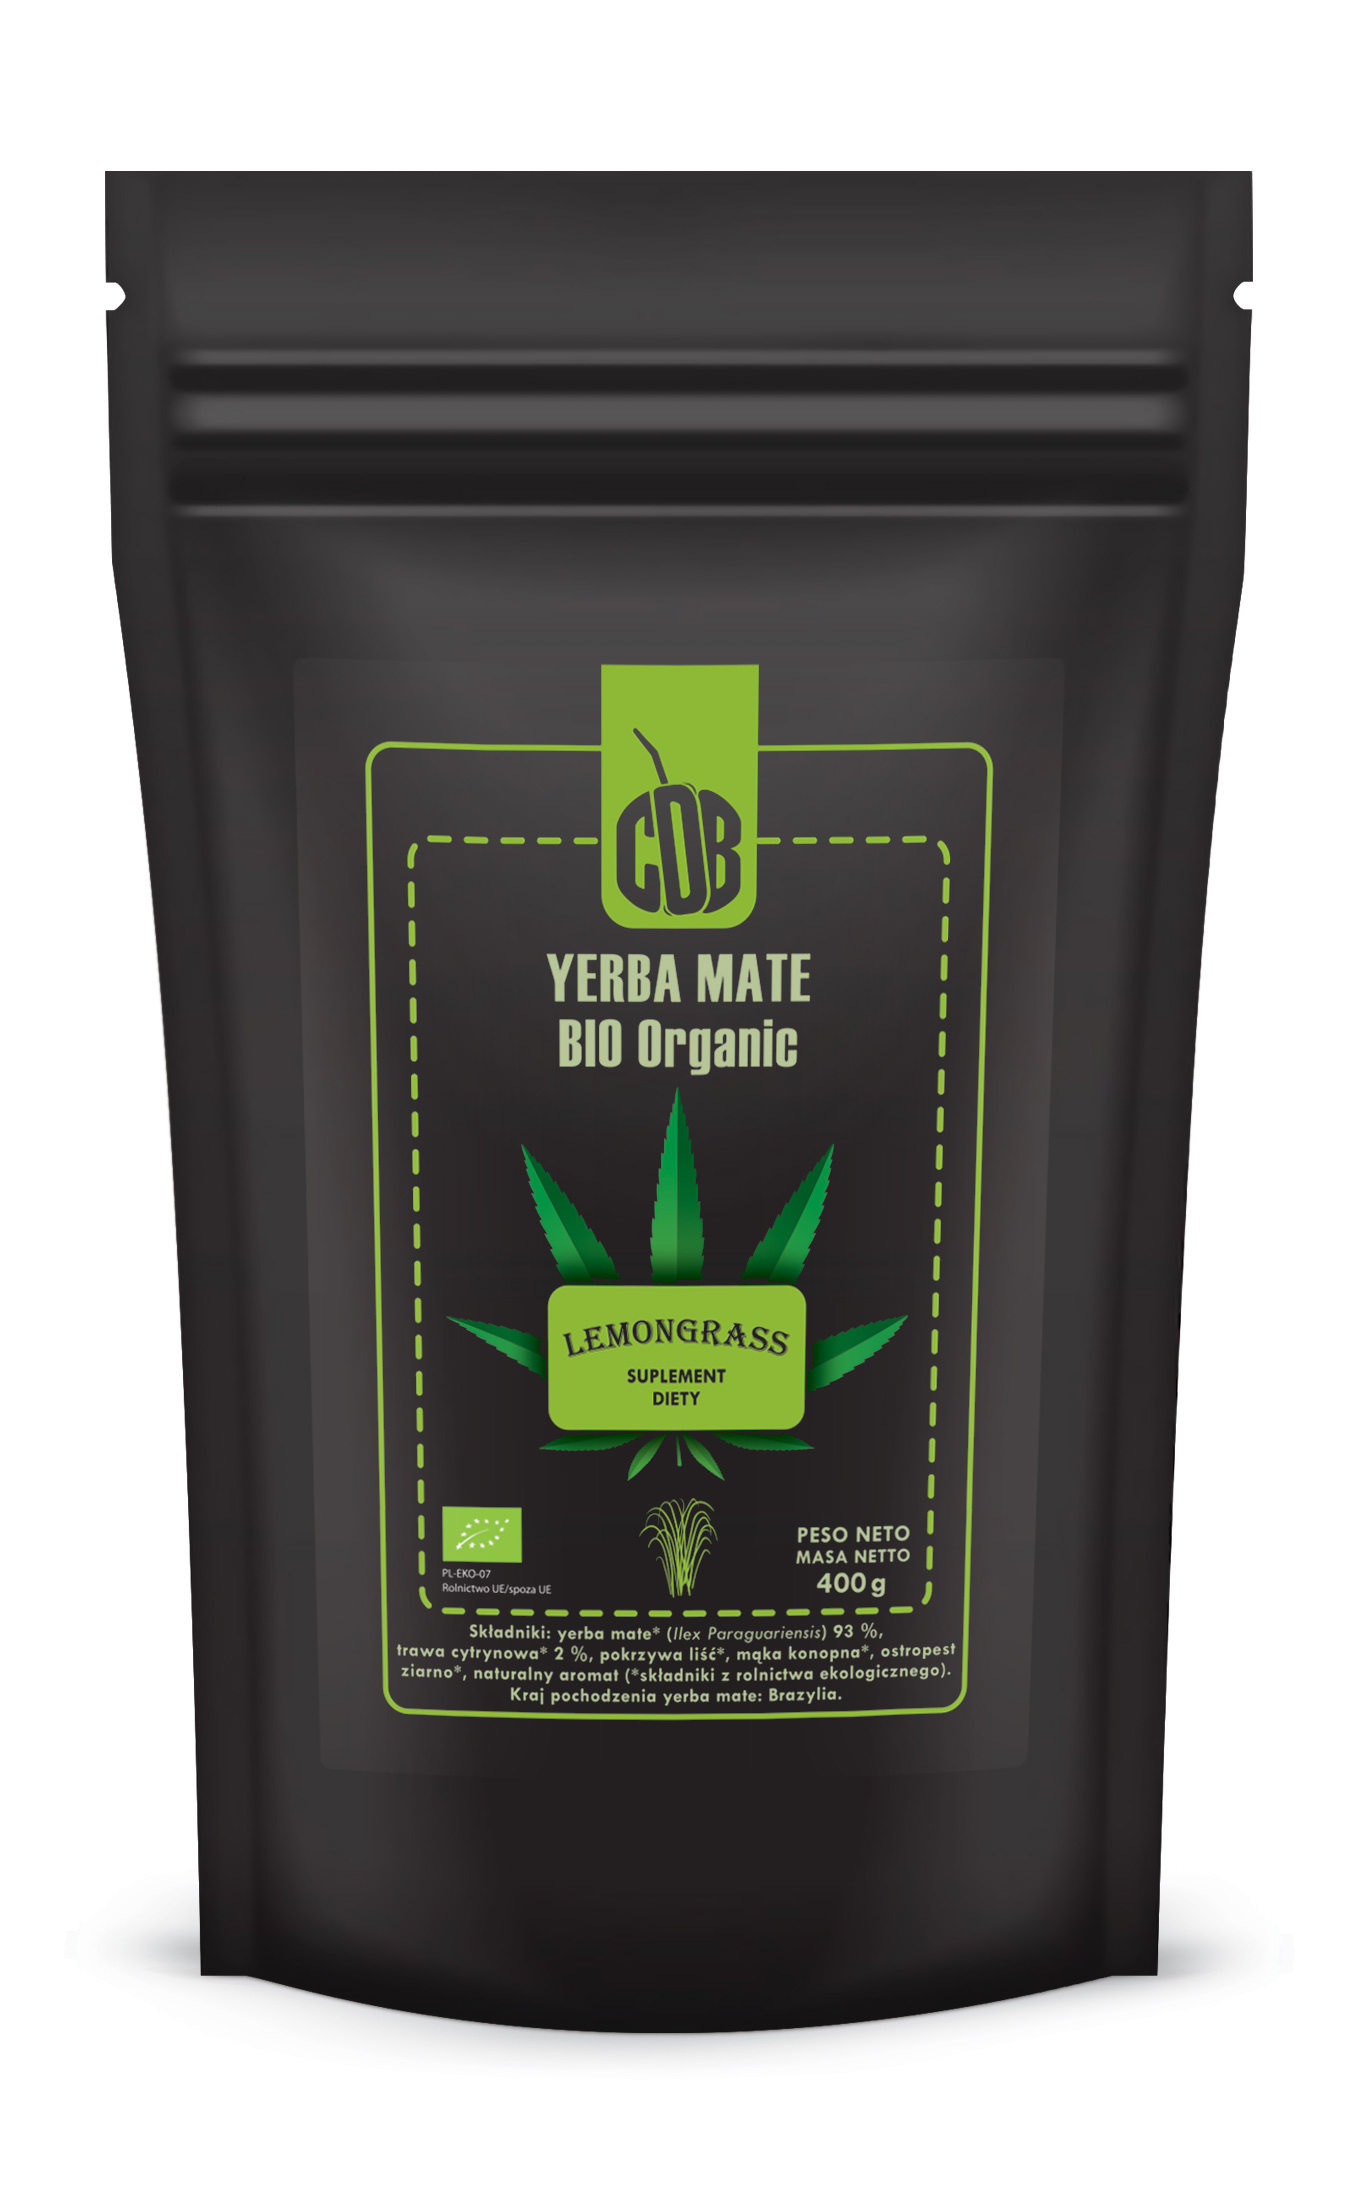 CDB-Lemongrass